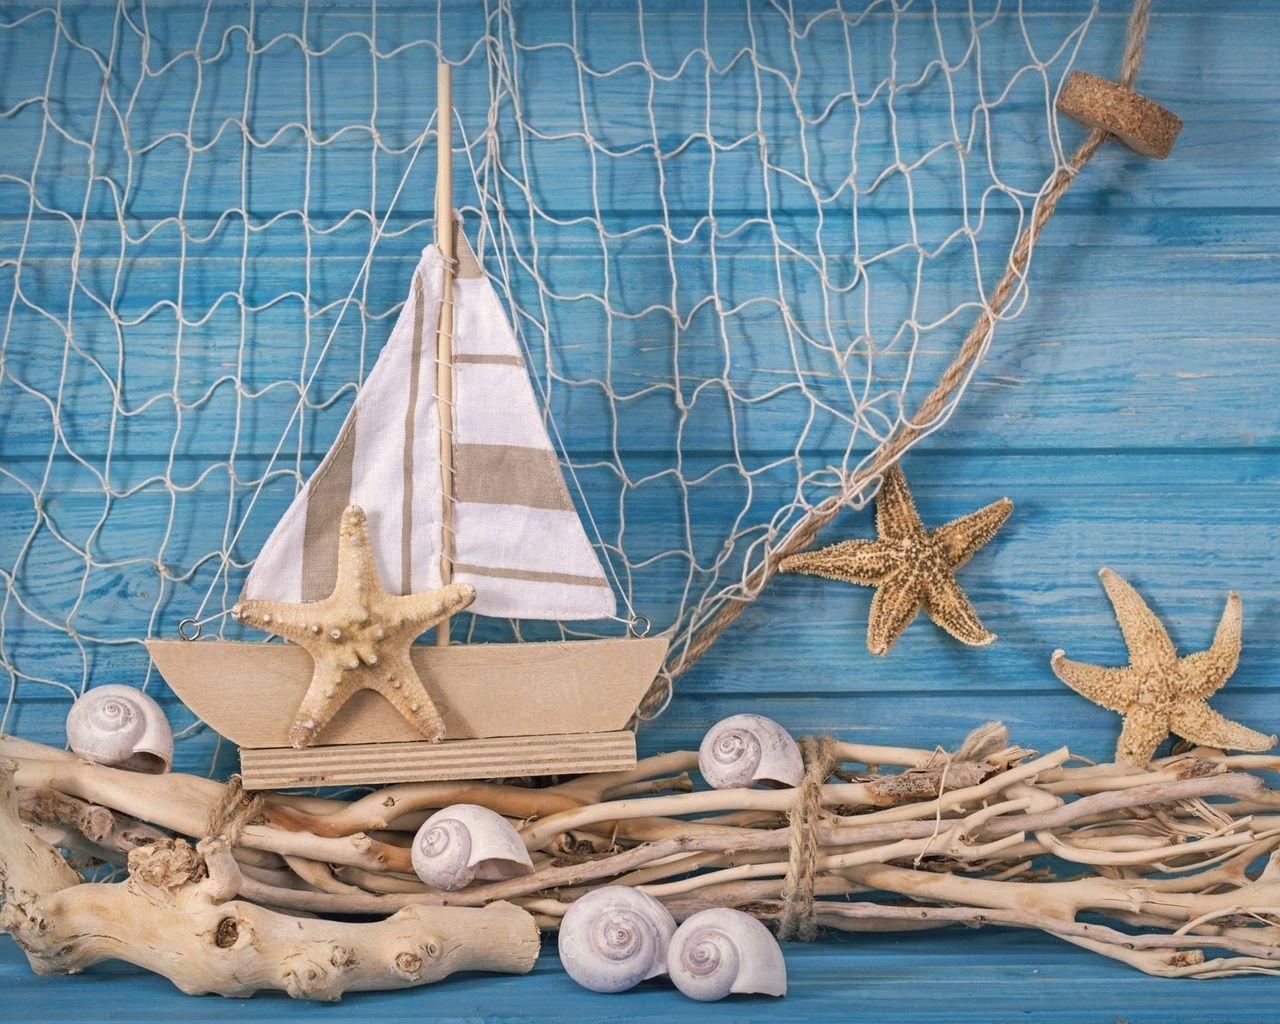 Картинки на морскую тему для открыток, про